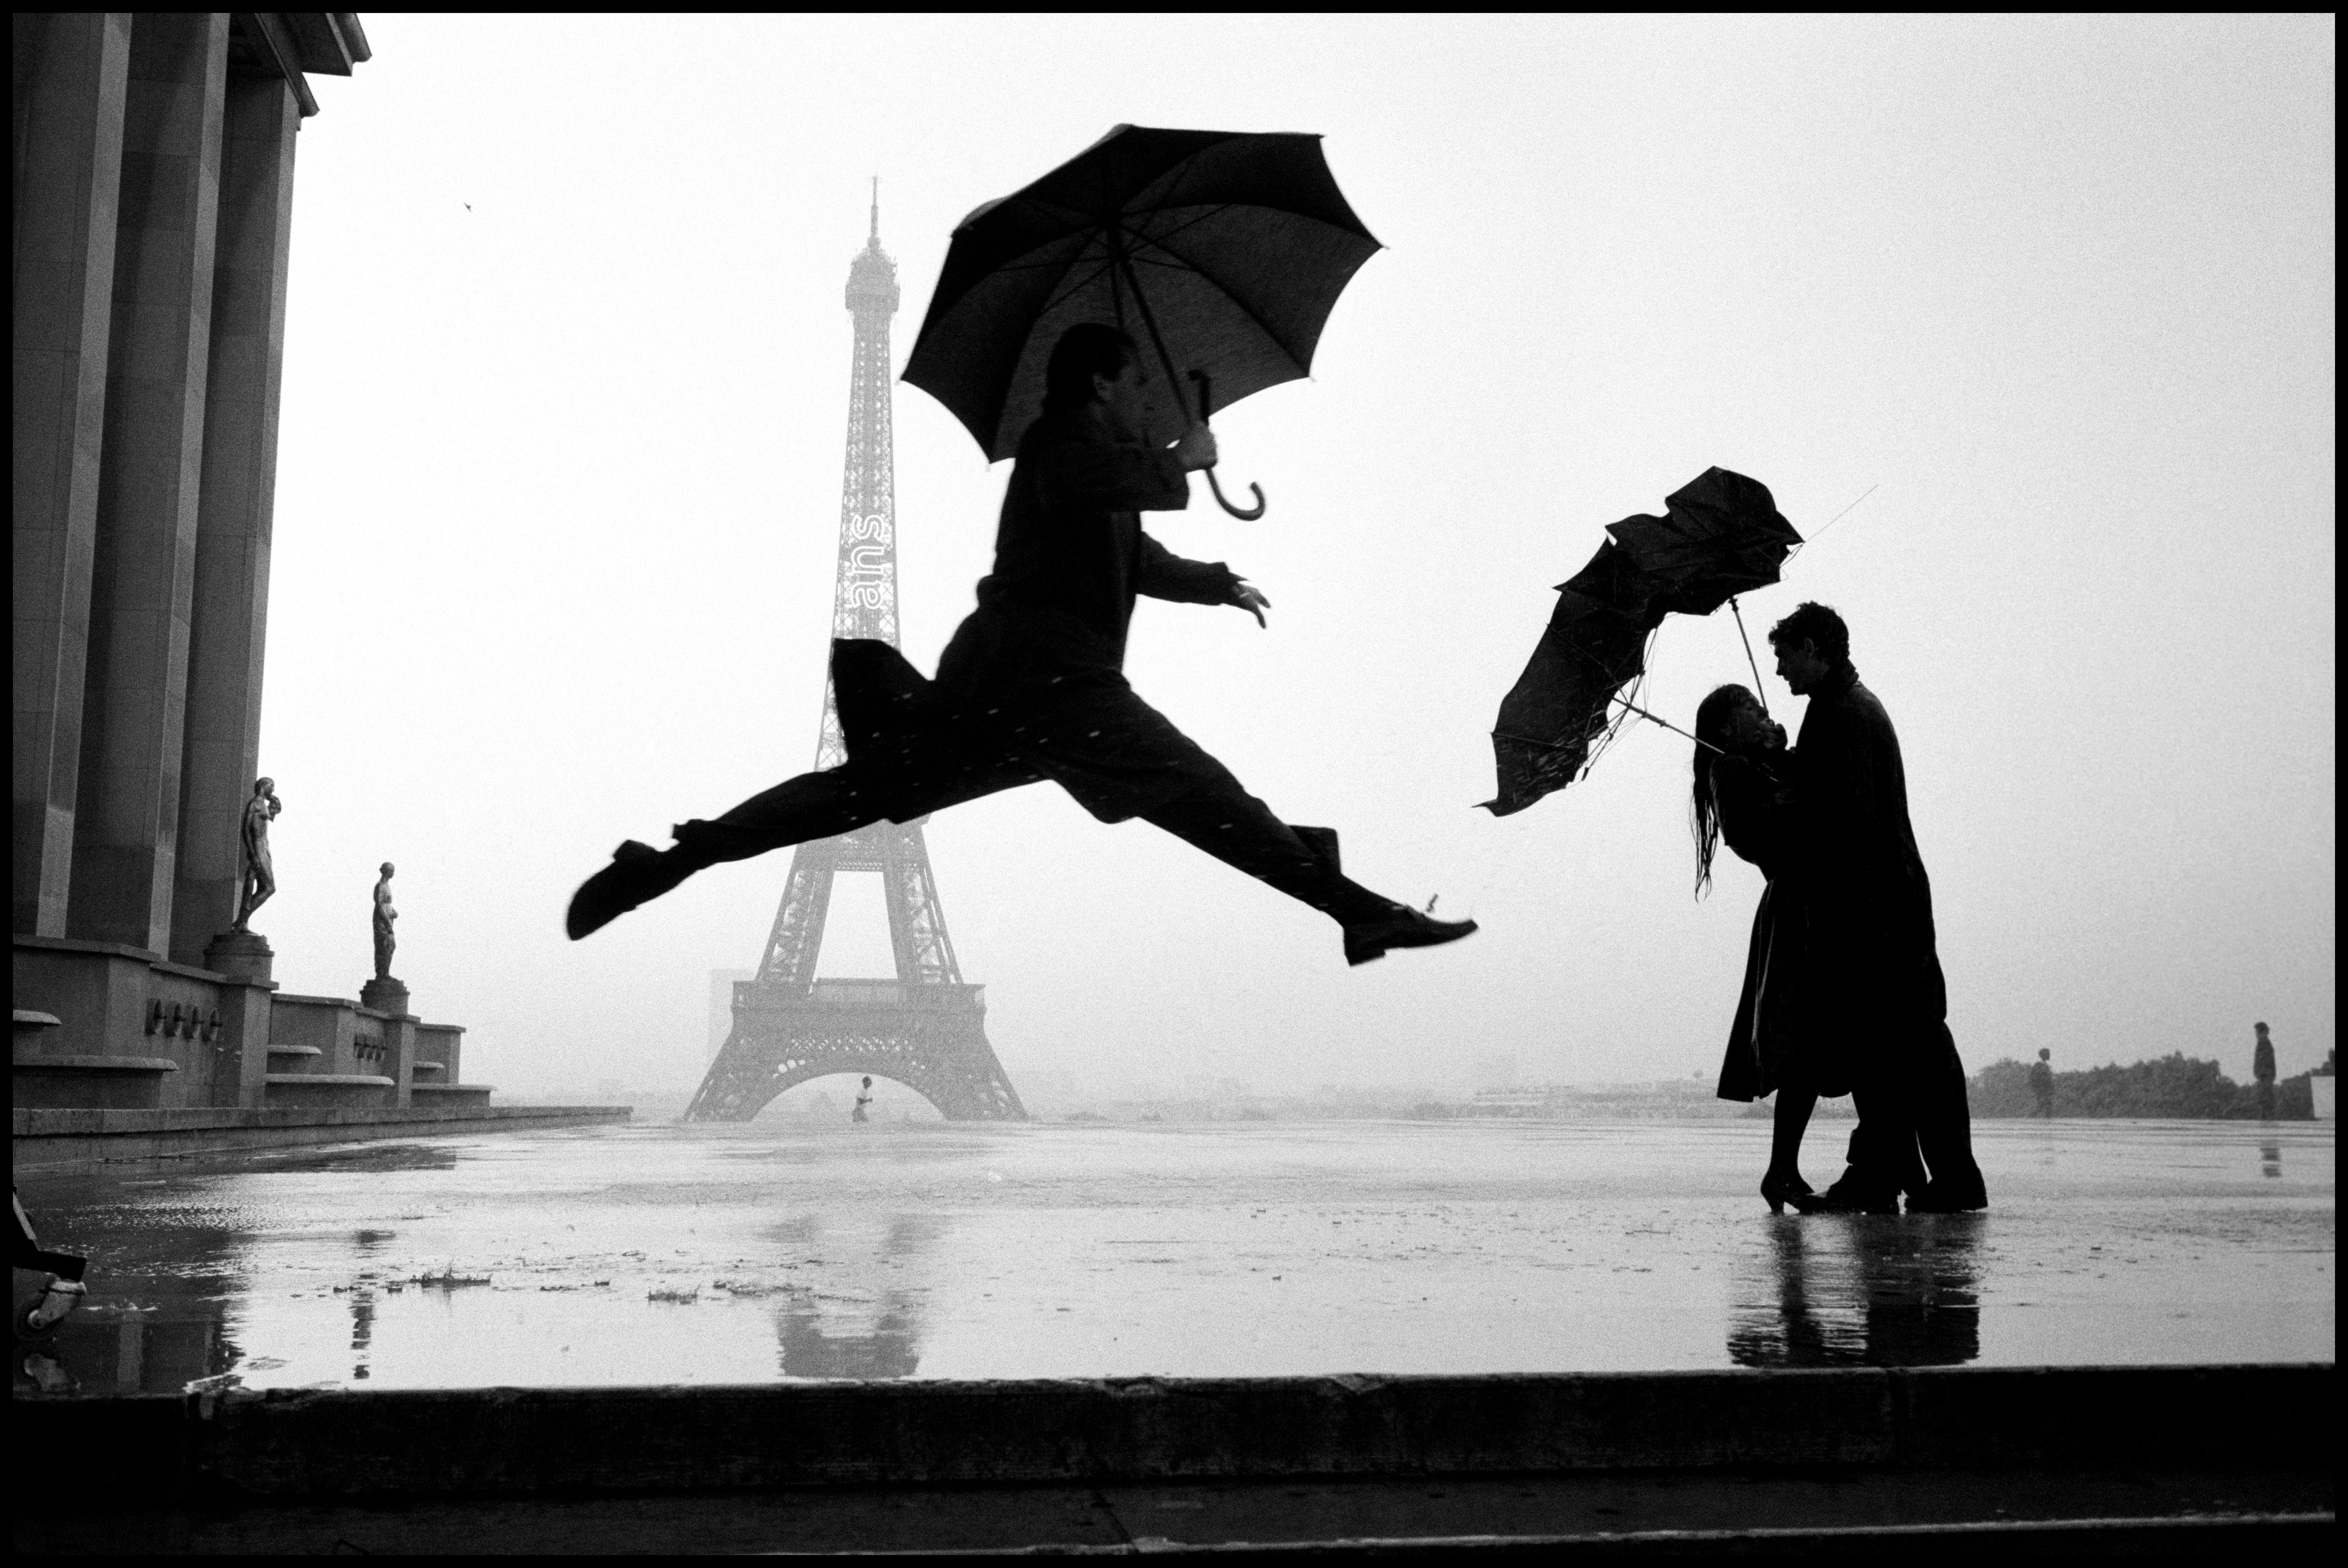 FRANCE. Paris. 1989. Eiffel tower 100th anniversary.